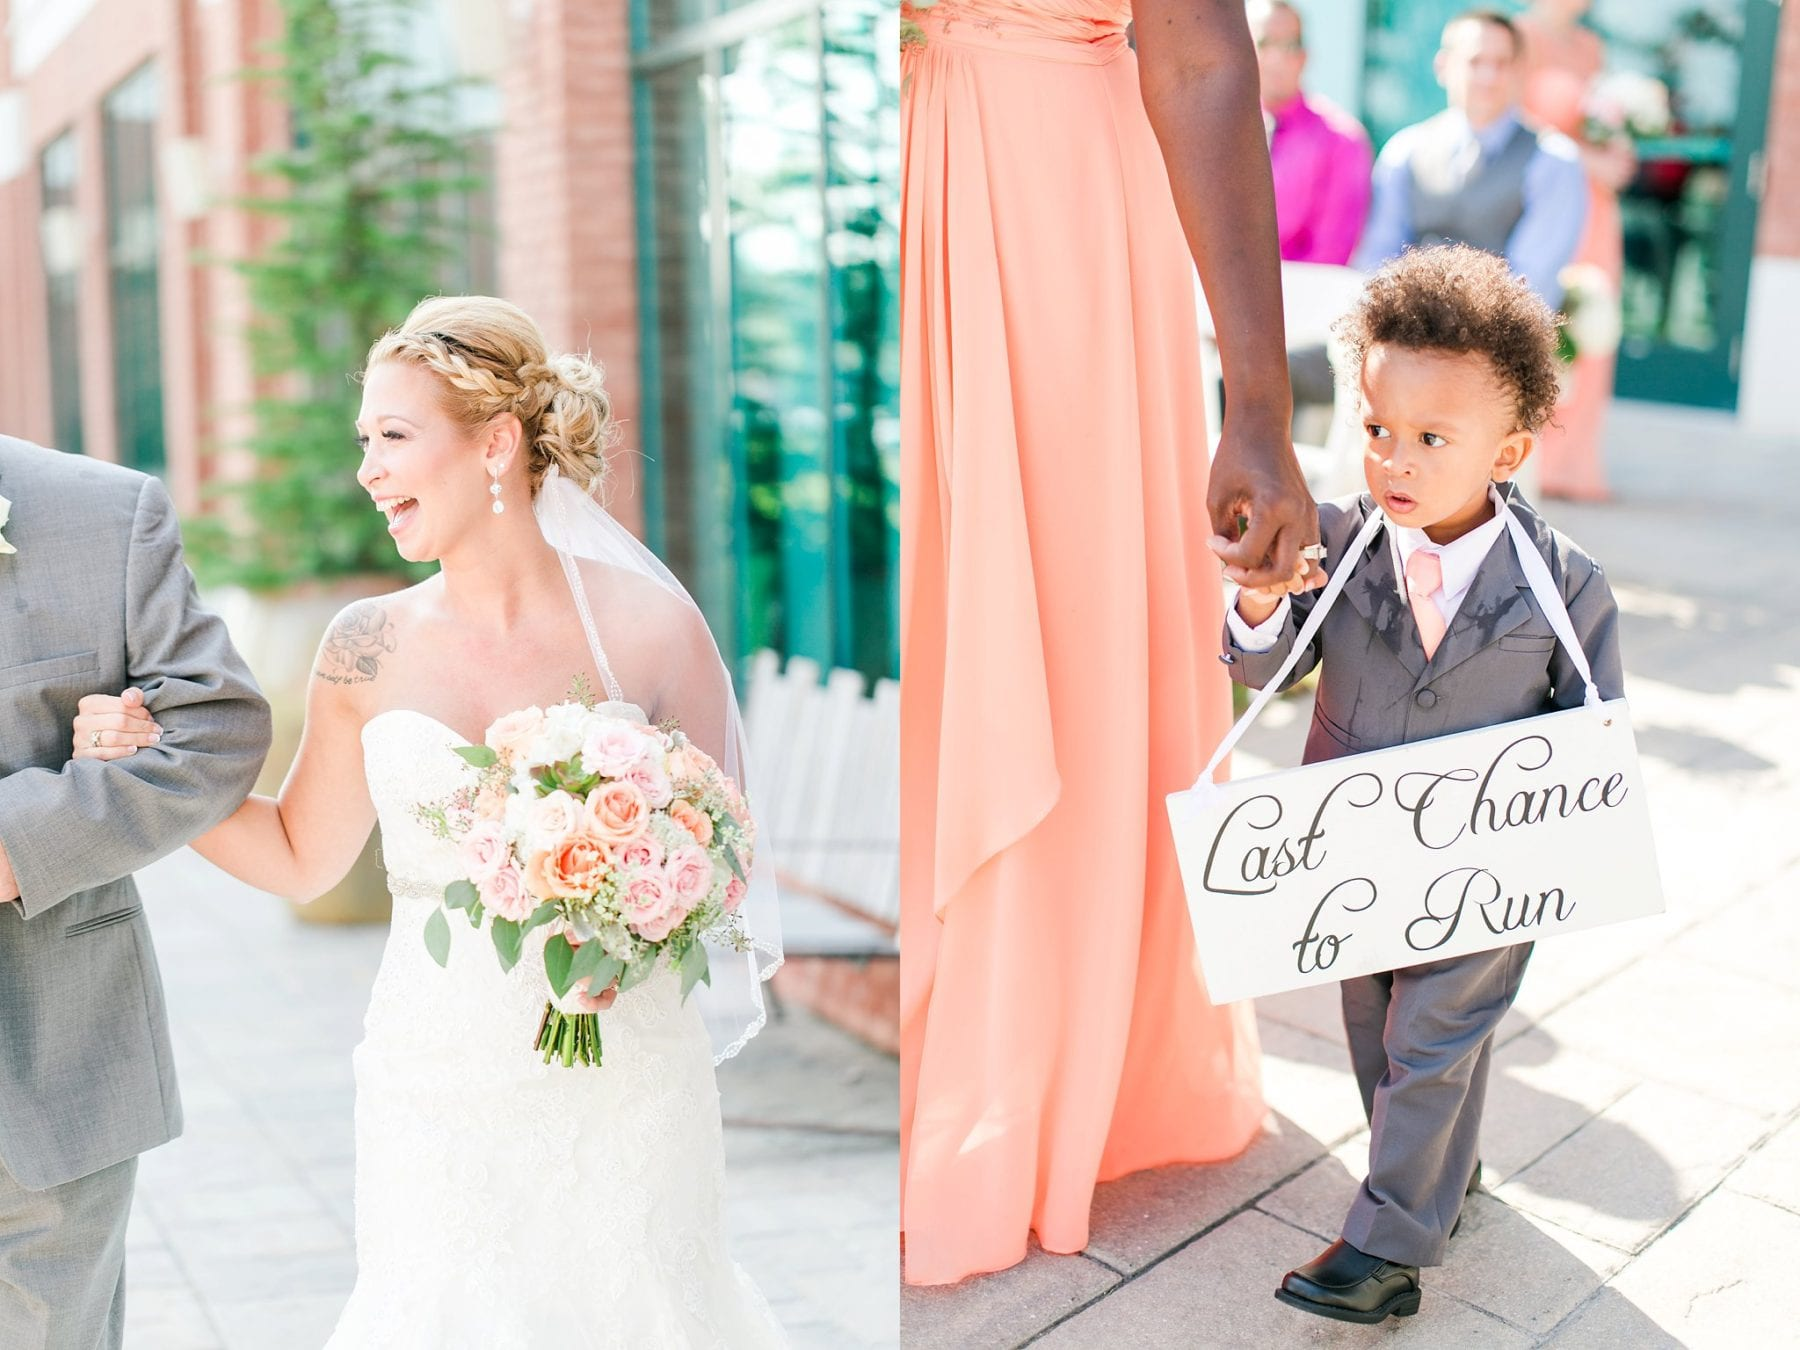 Waters Edge Wedding Photos Maryland Wedding Photographer Megan Kelsey Photography Katie & Conor-203.JPG